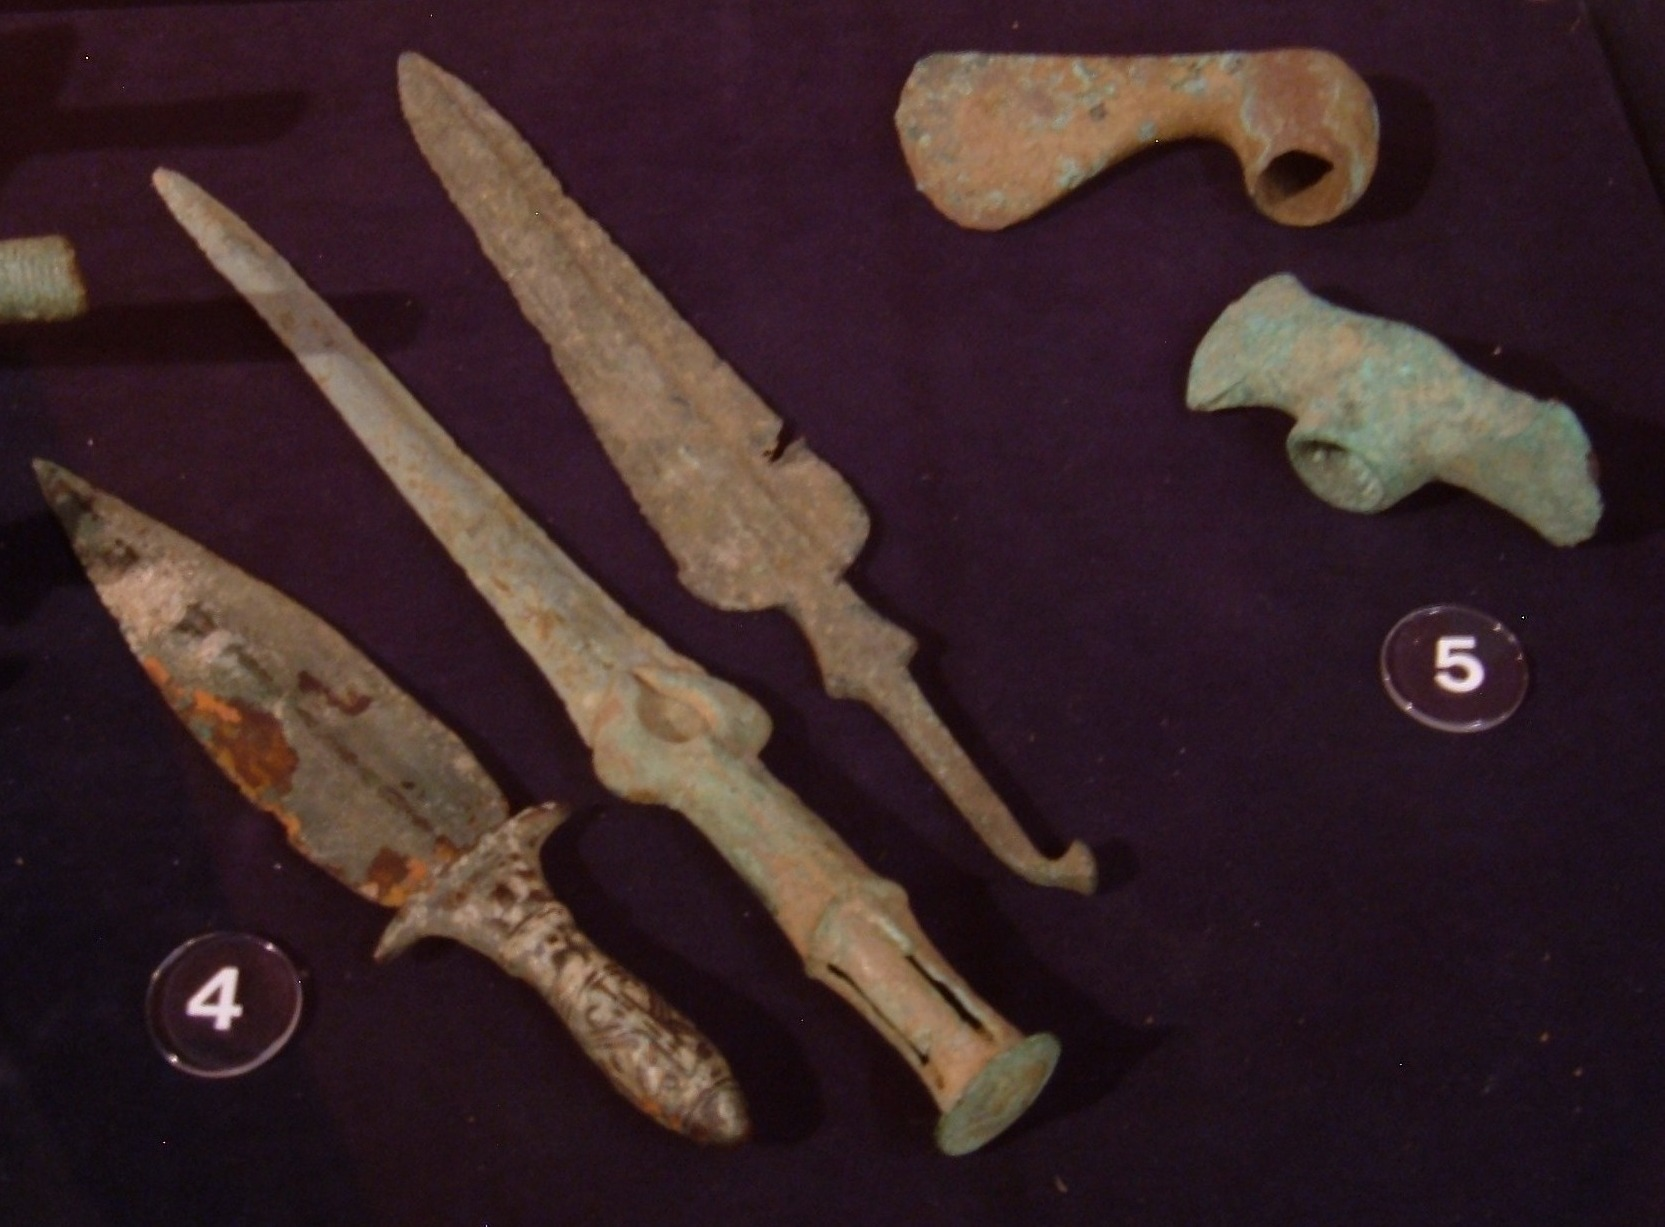 Hittites Weapons And Tools File:Mesopotamian bron...